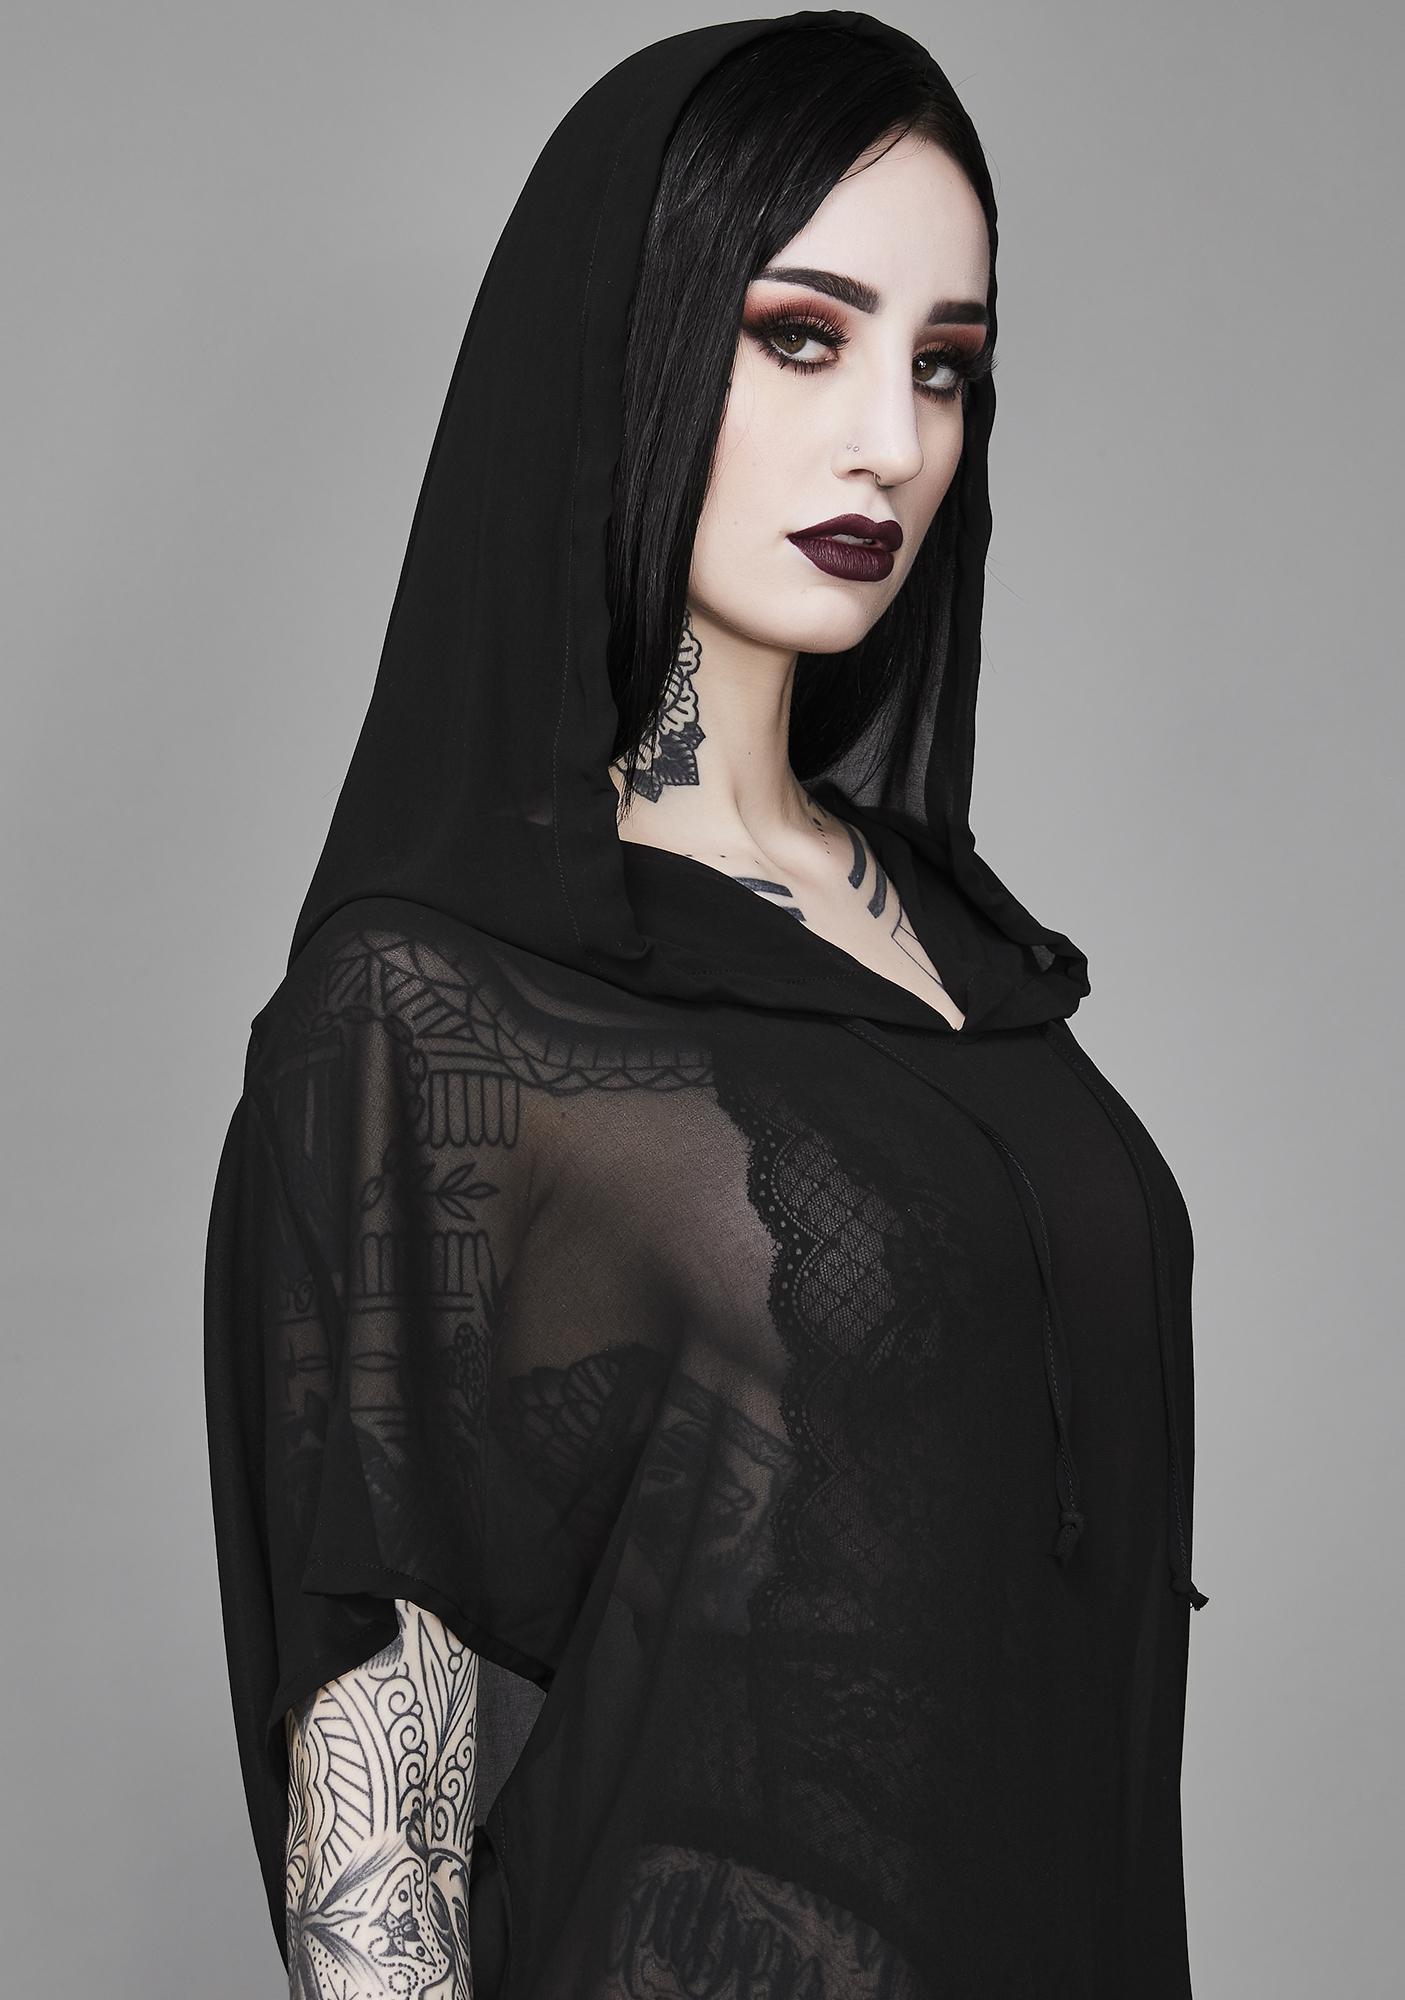 Widow Aphotic Priestess Chiffon Tunic